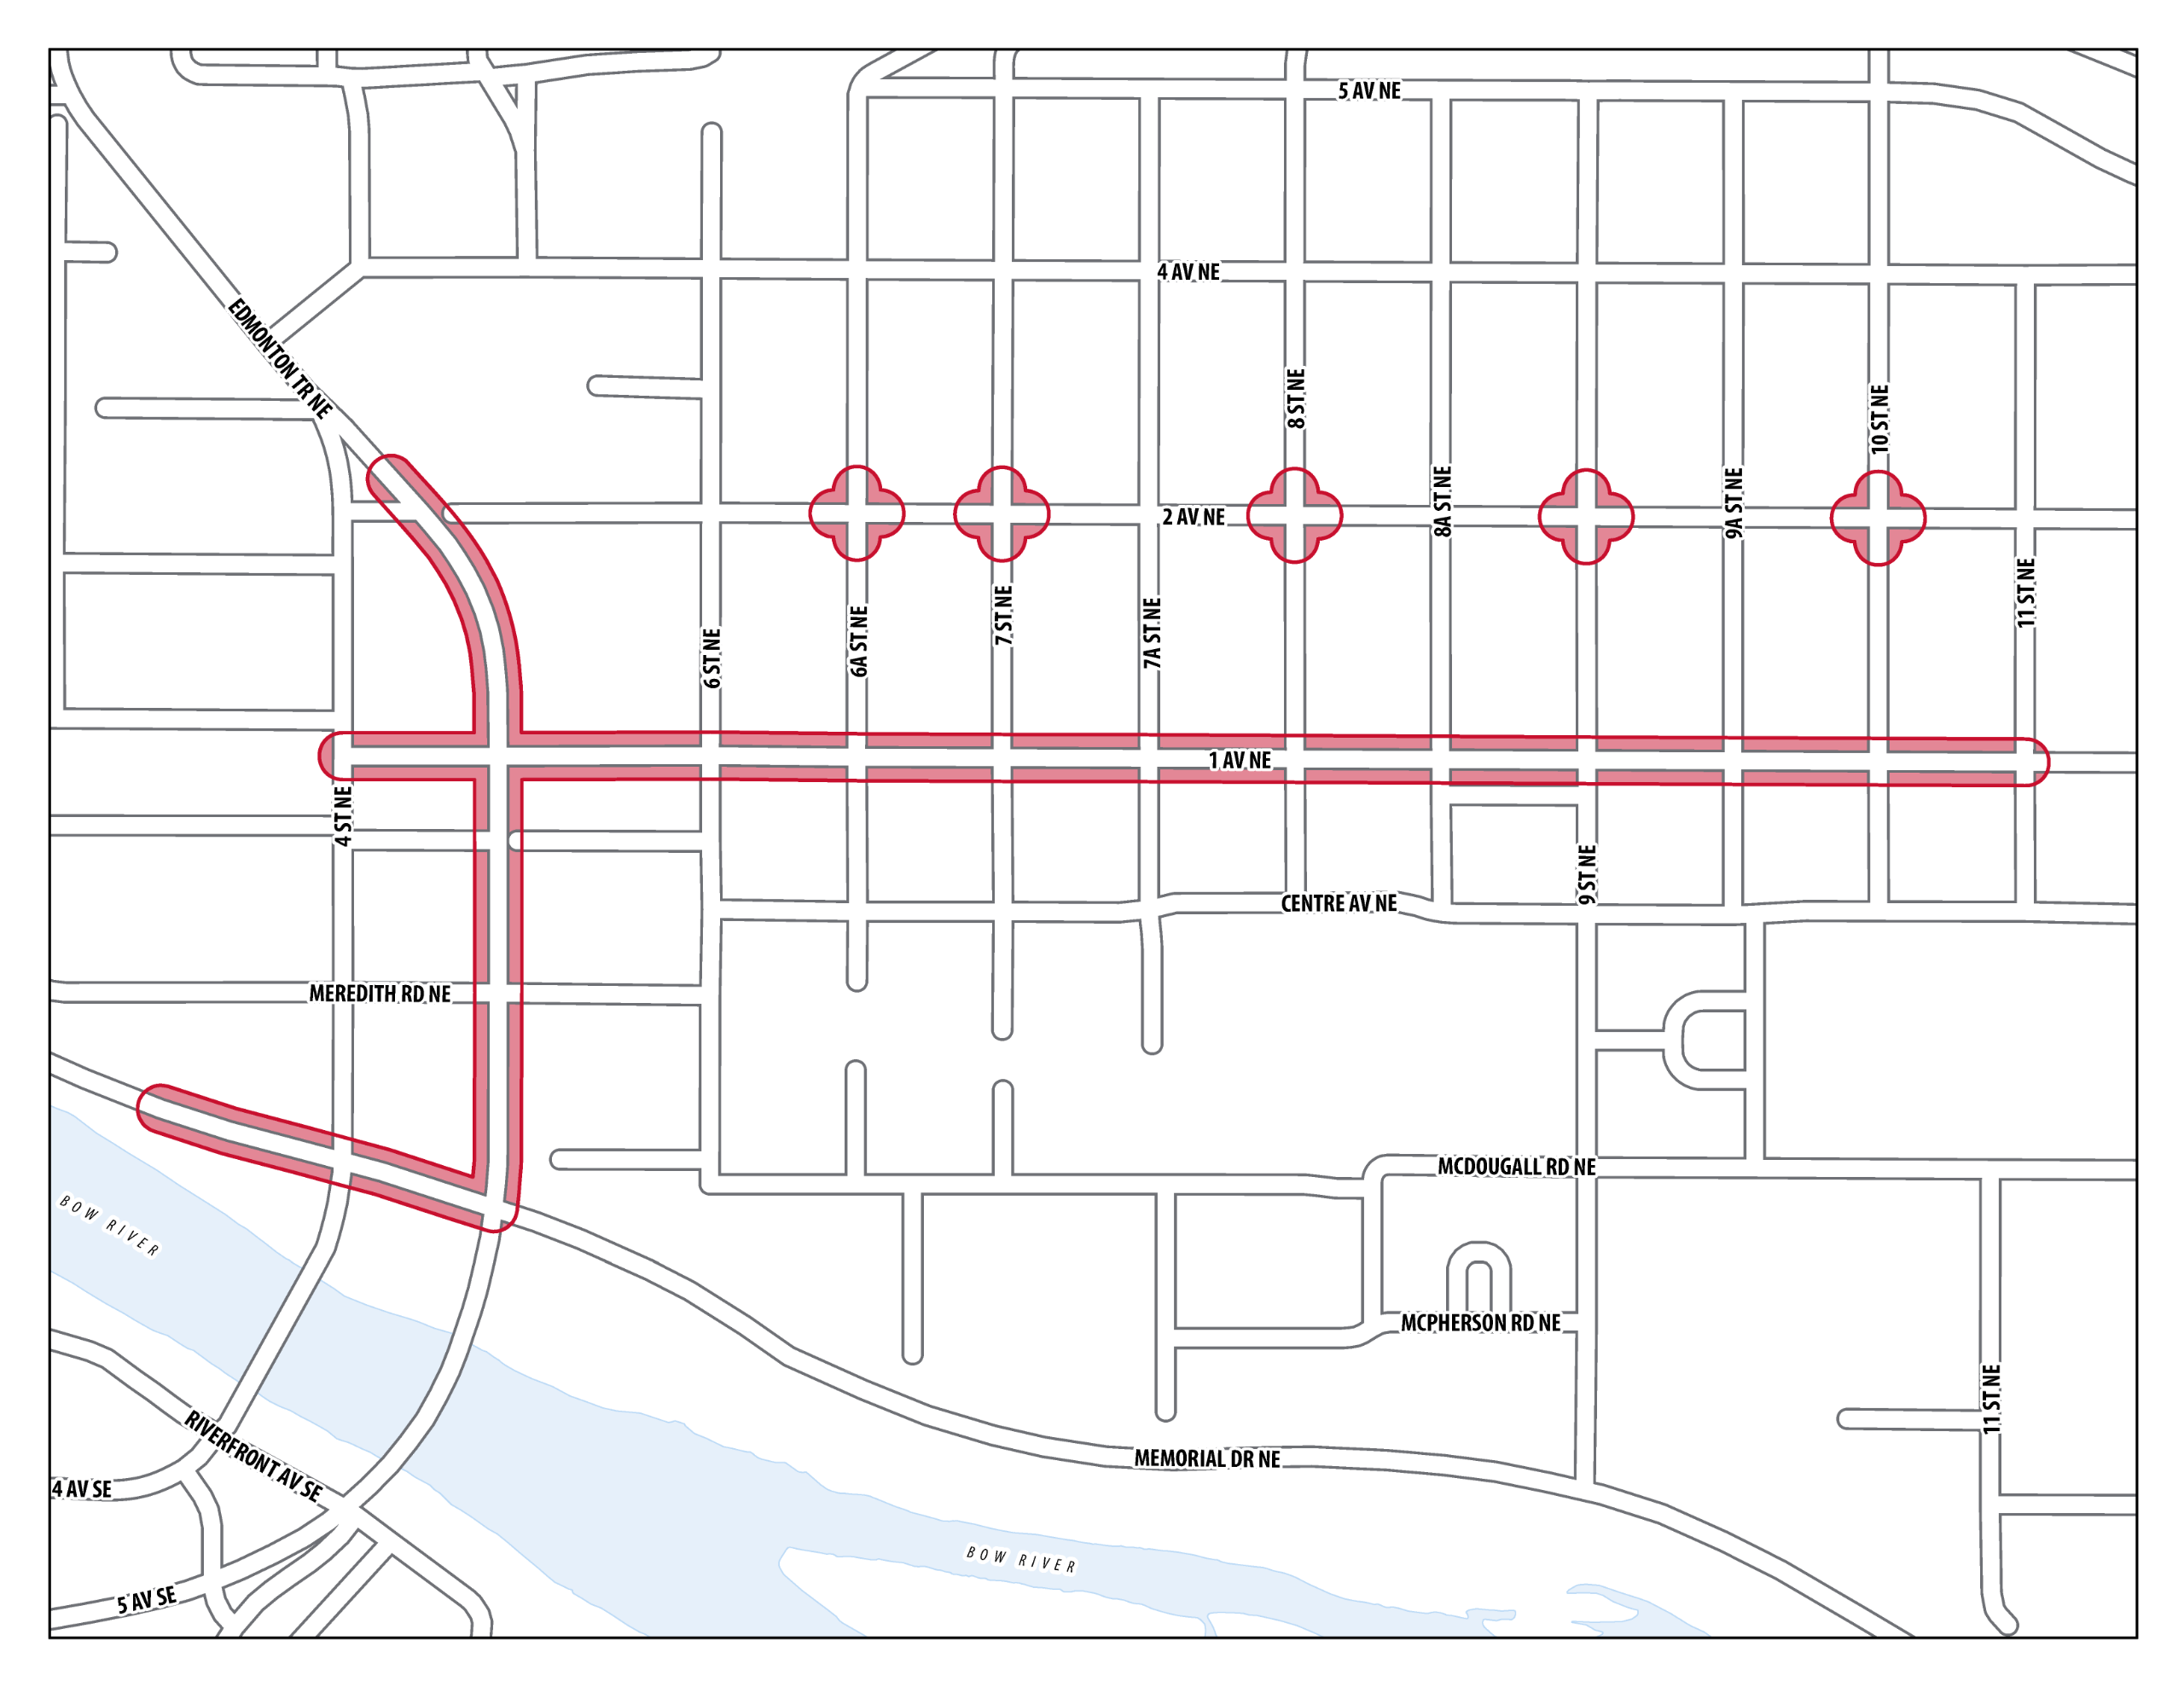 1 Avenue N.E. Main Streets Project Area